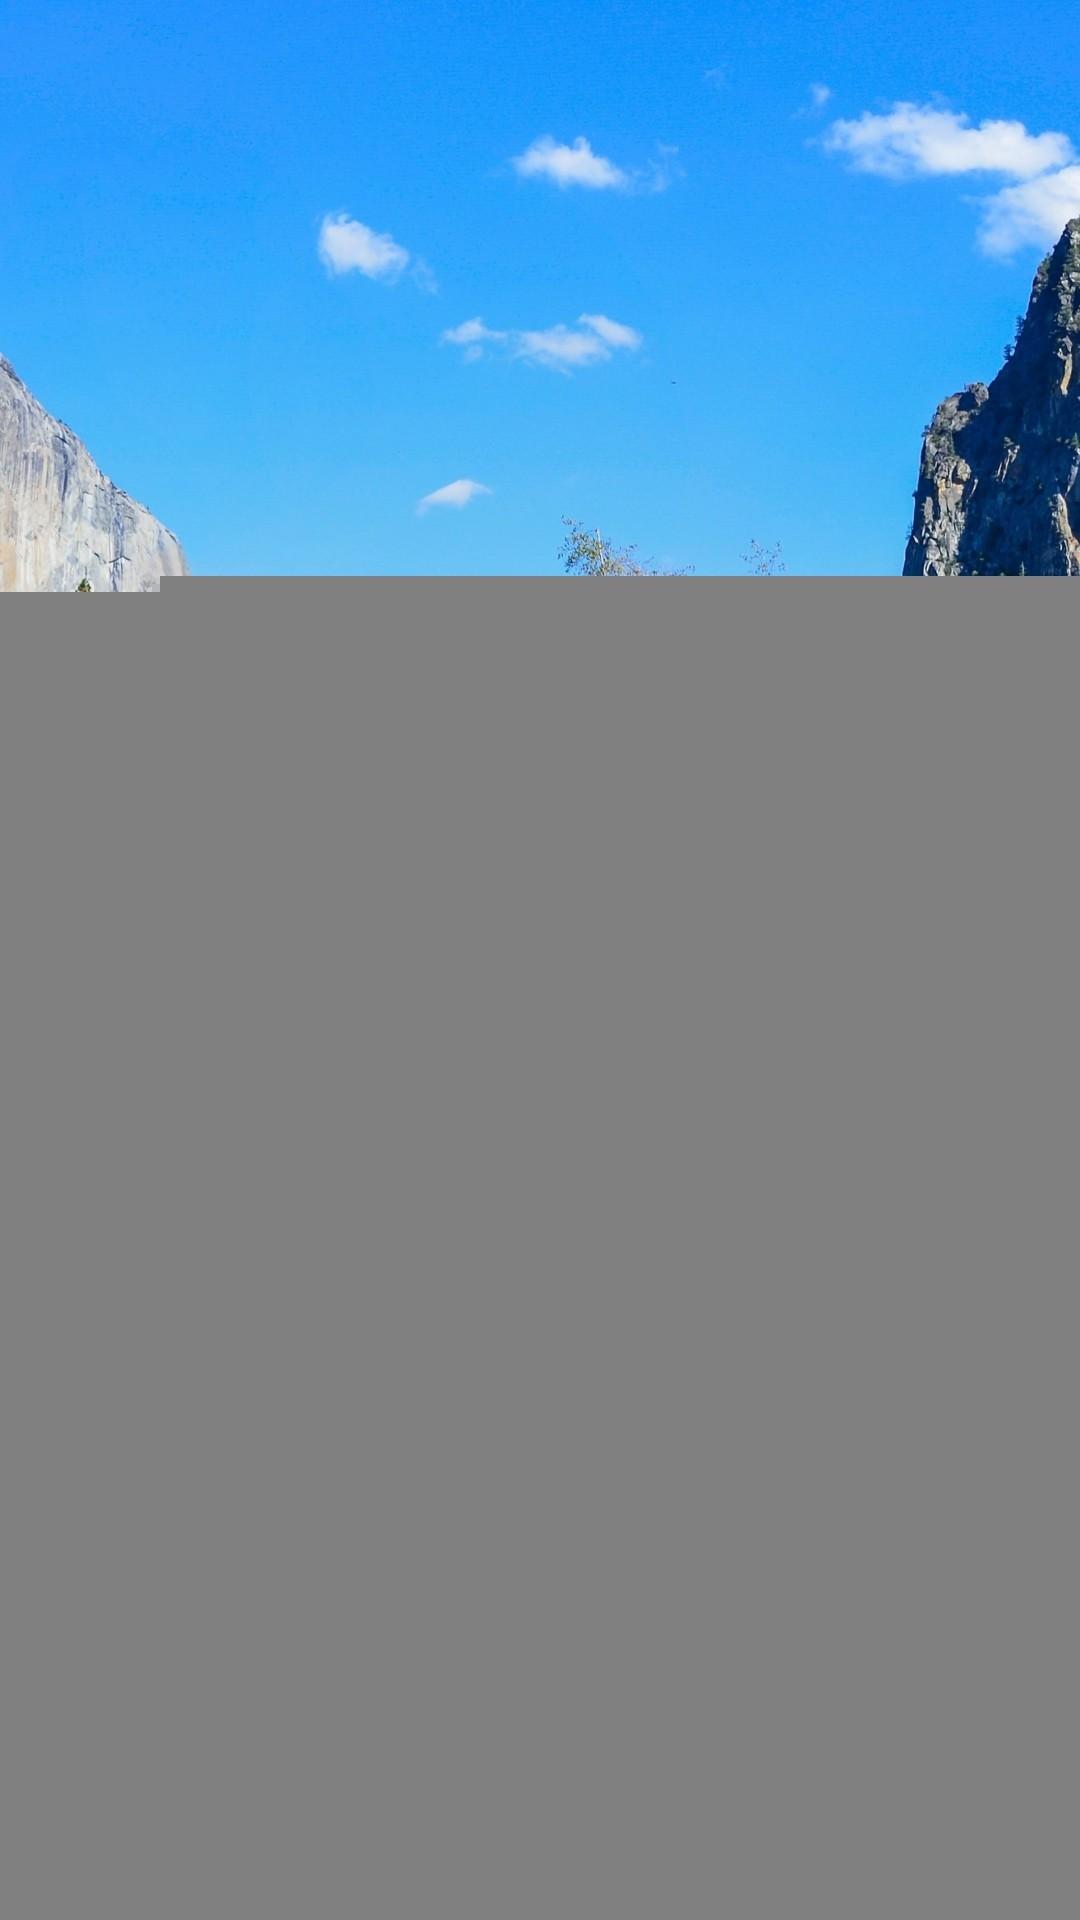 Yosemite National Park Lake Rocks Mountains Autumn Nature iPhone 8 wallpaper